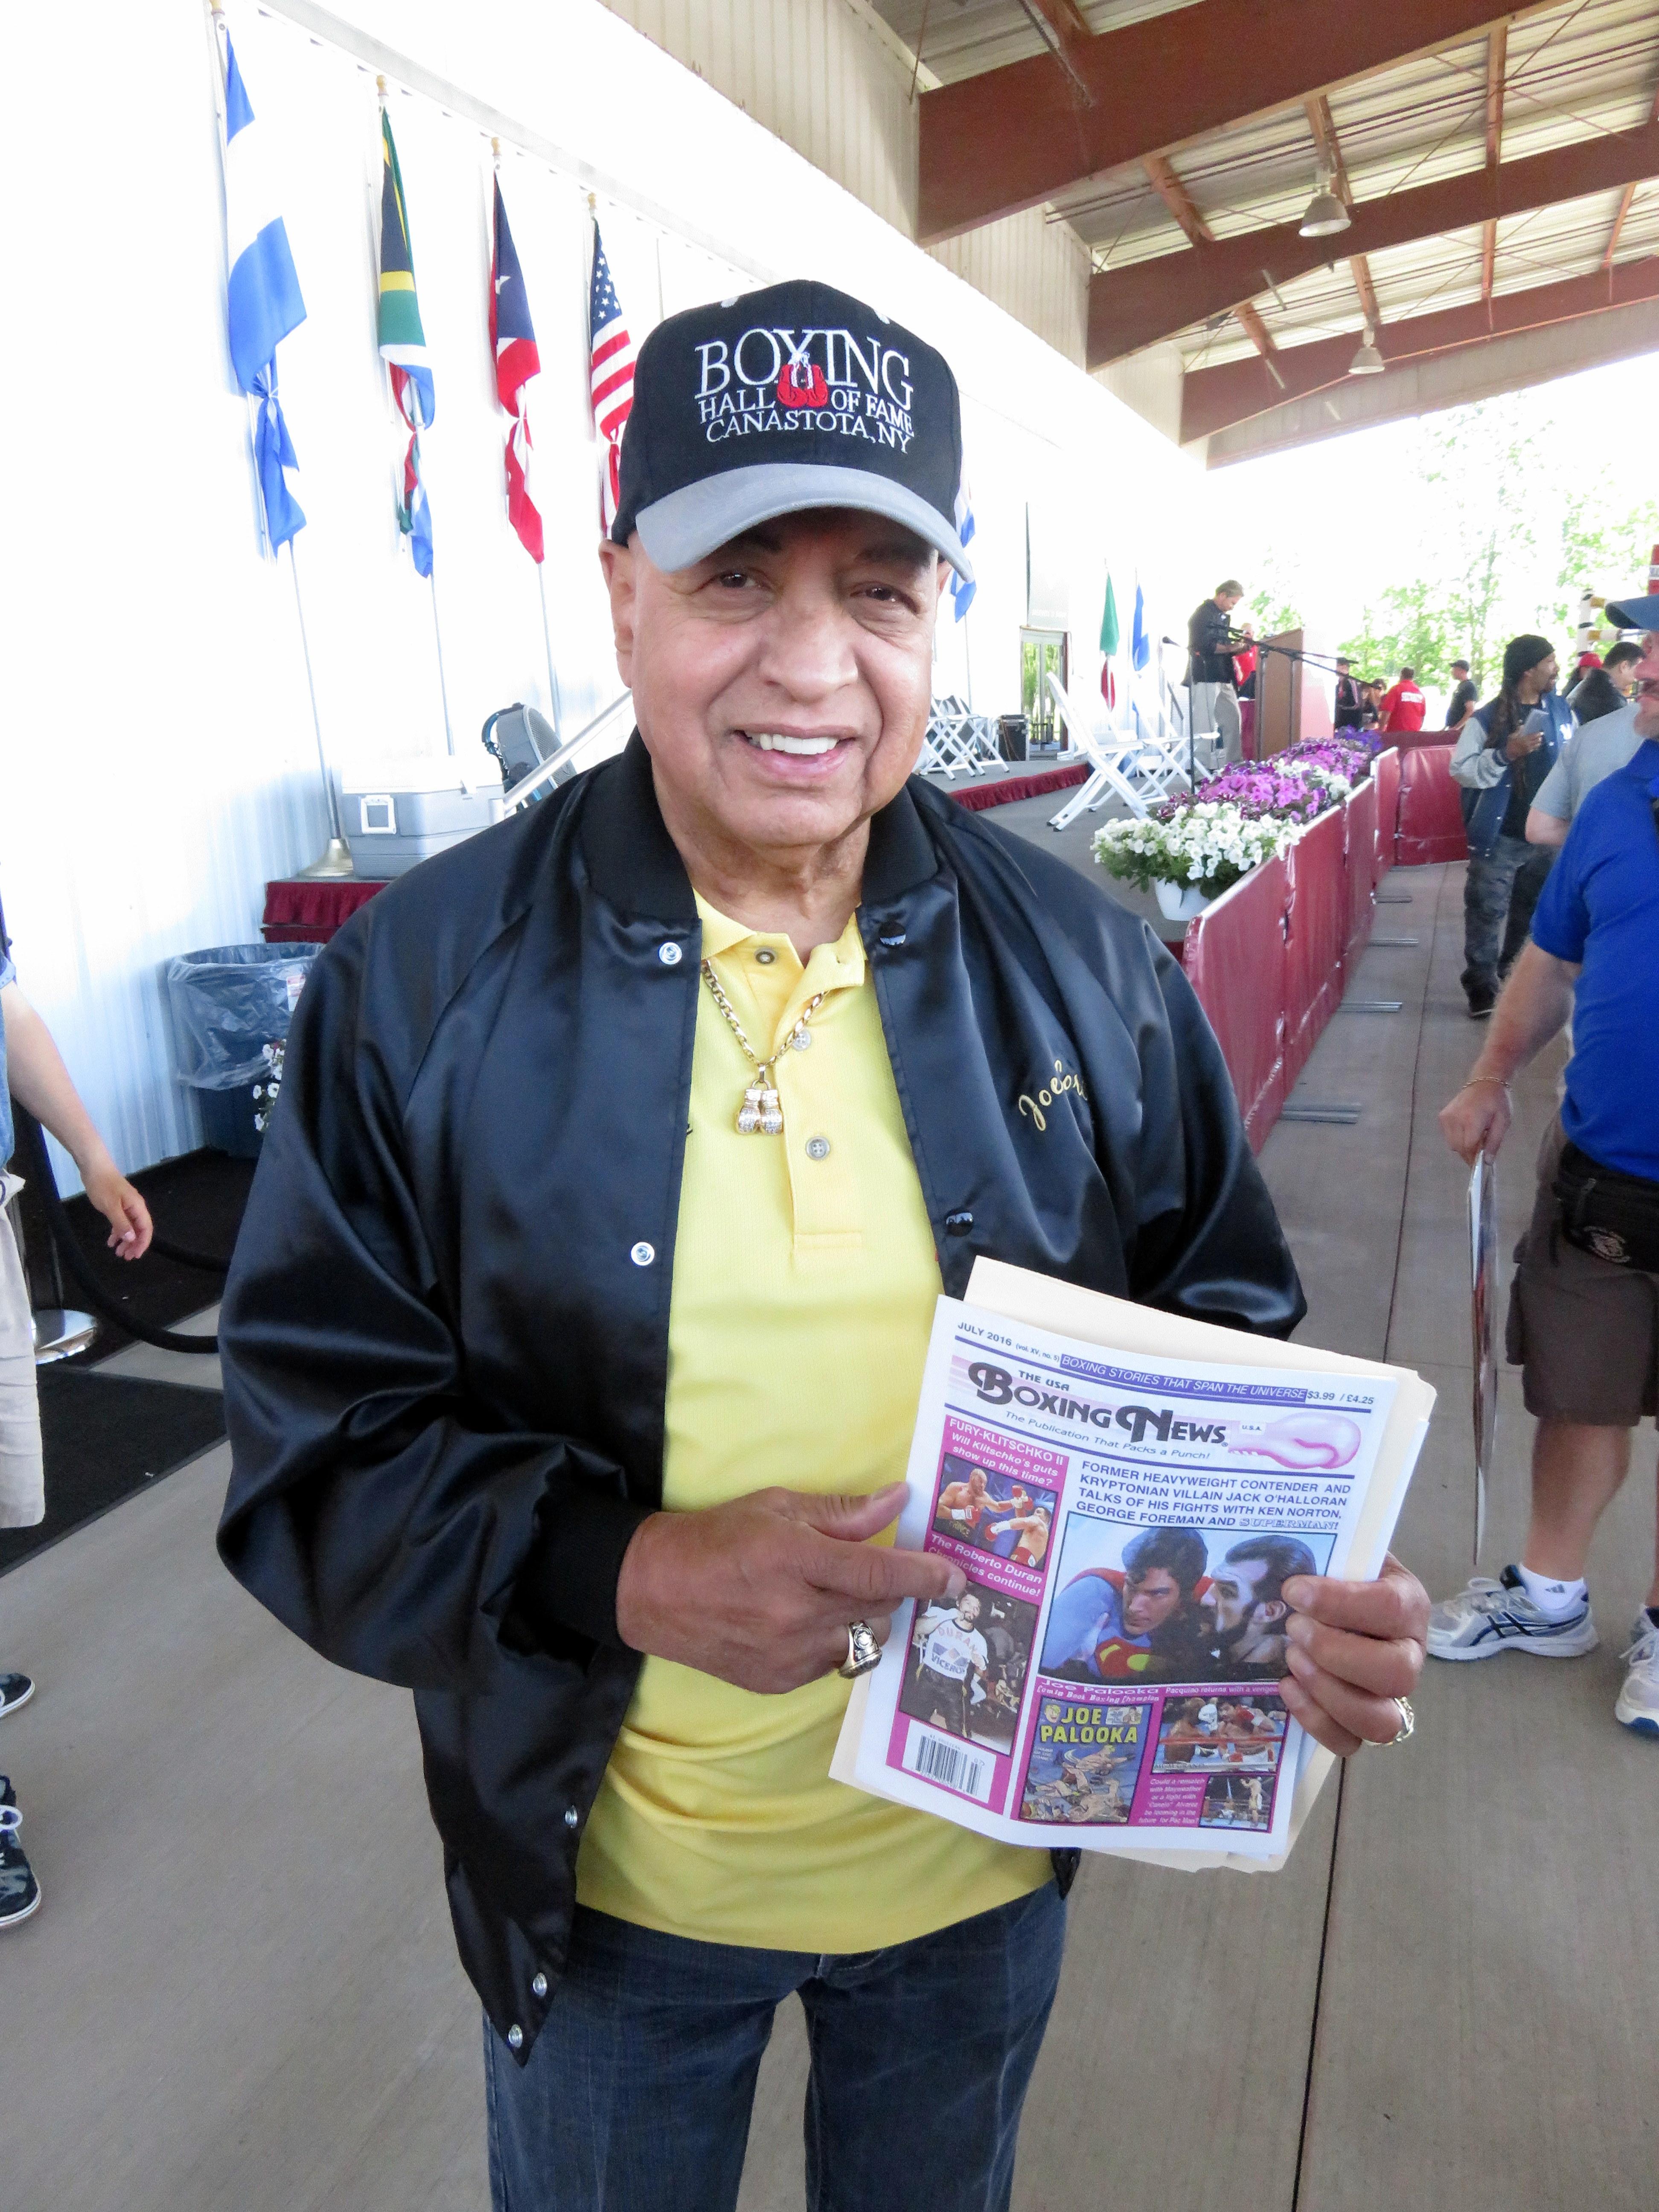 FINALThe USA Boxing News with Hall of Fame referee Joe Cortez.FINAL